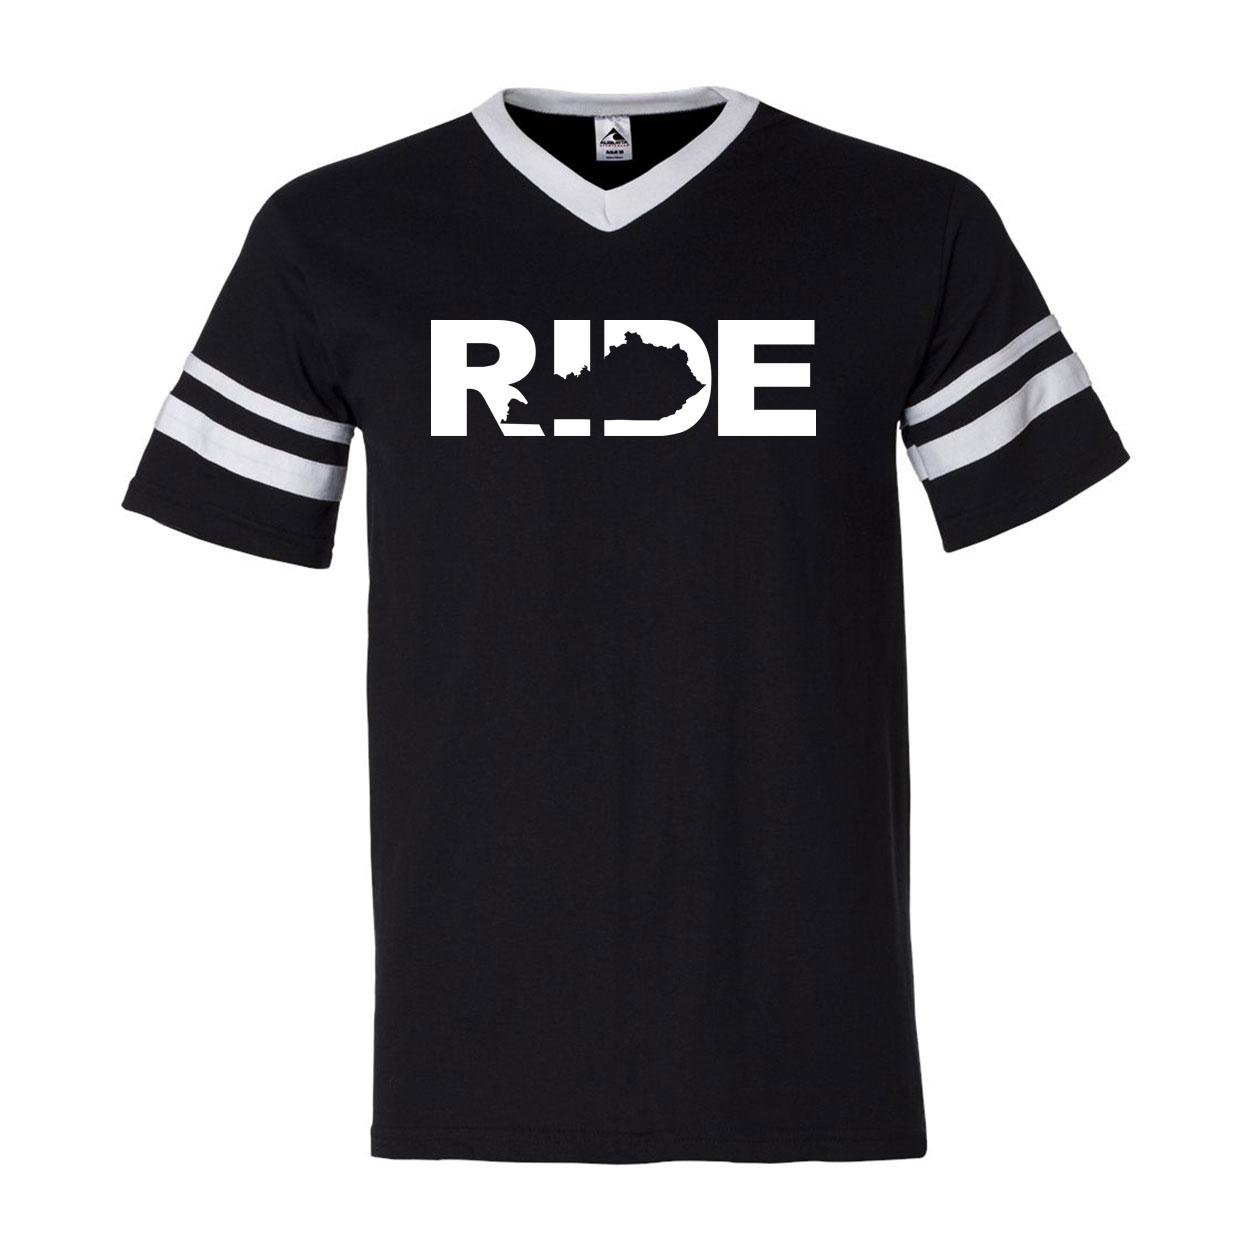 Ride Kentucky Classic Premium Striped Jersey T-Shirt Black/White (White Logo)